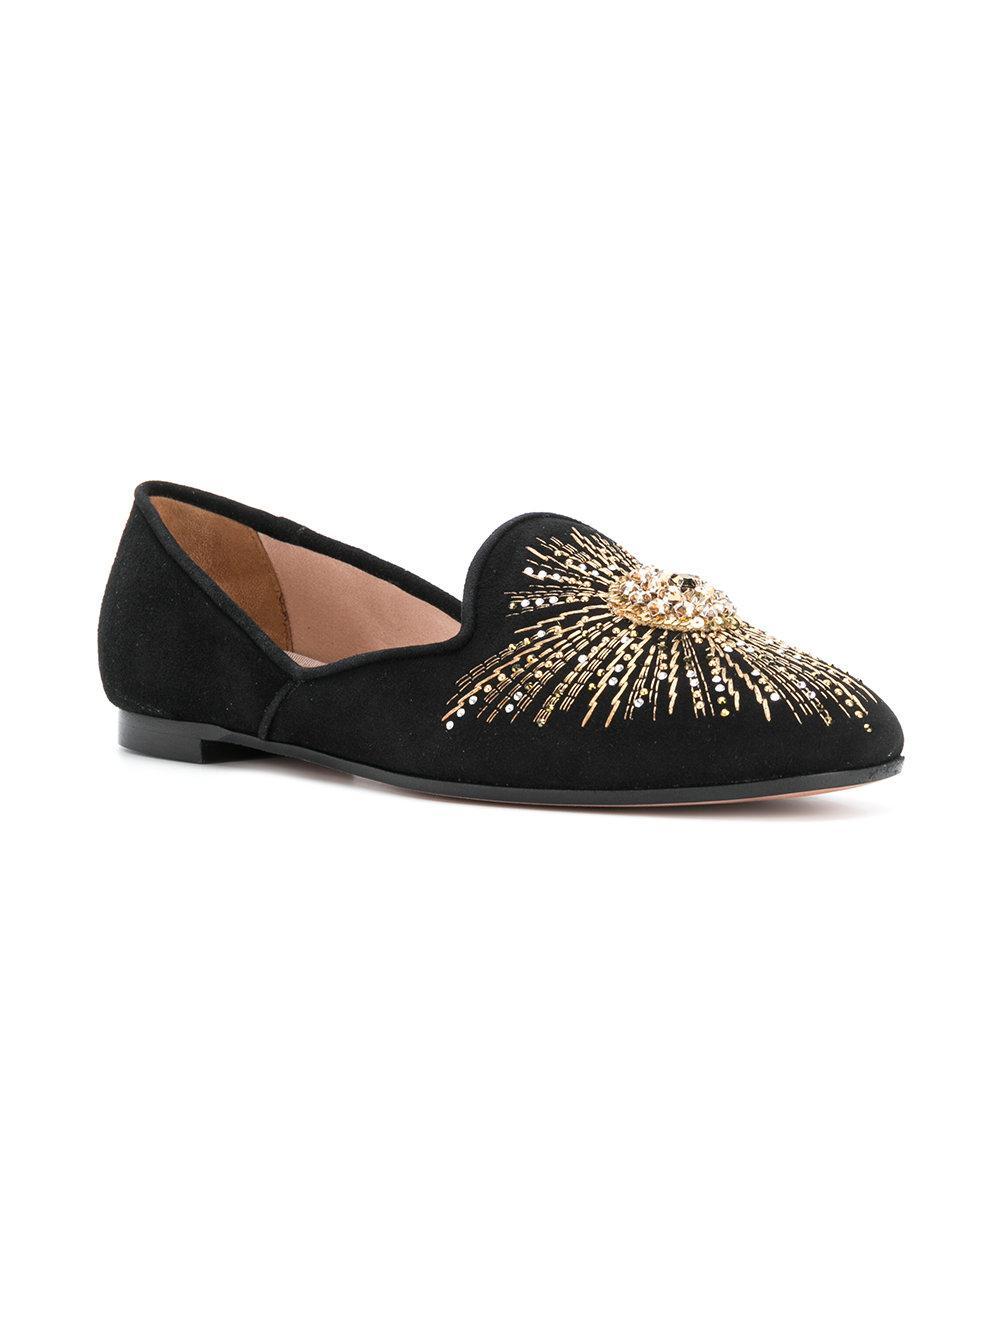 Sunlight loafers - Black Aquazzura k2ko7uXzC1